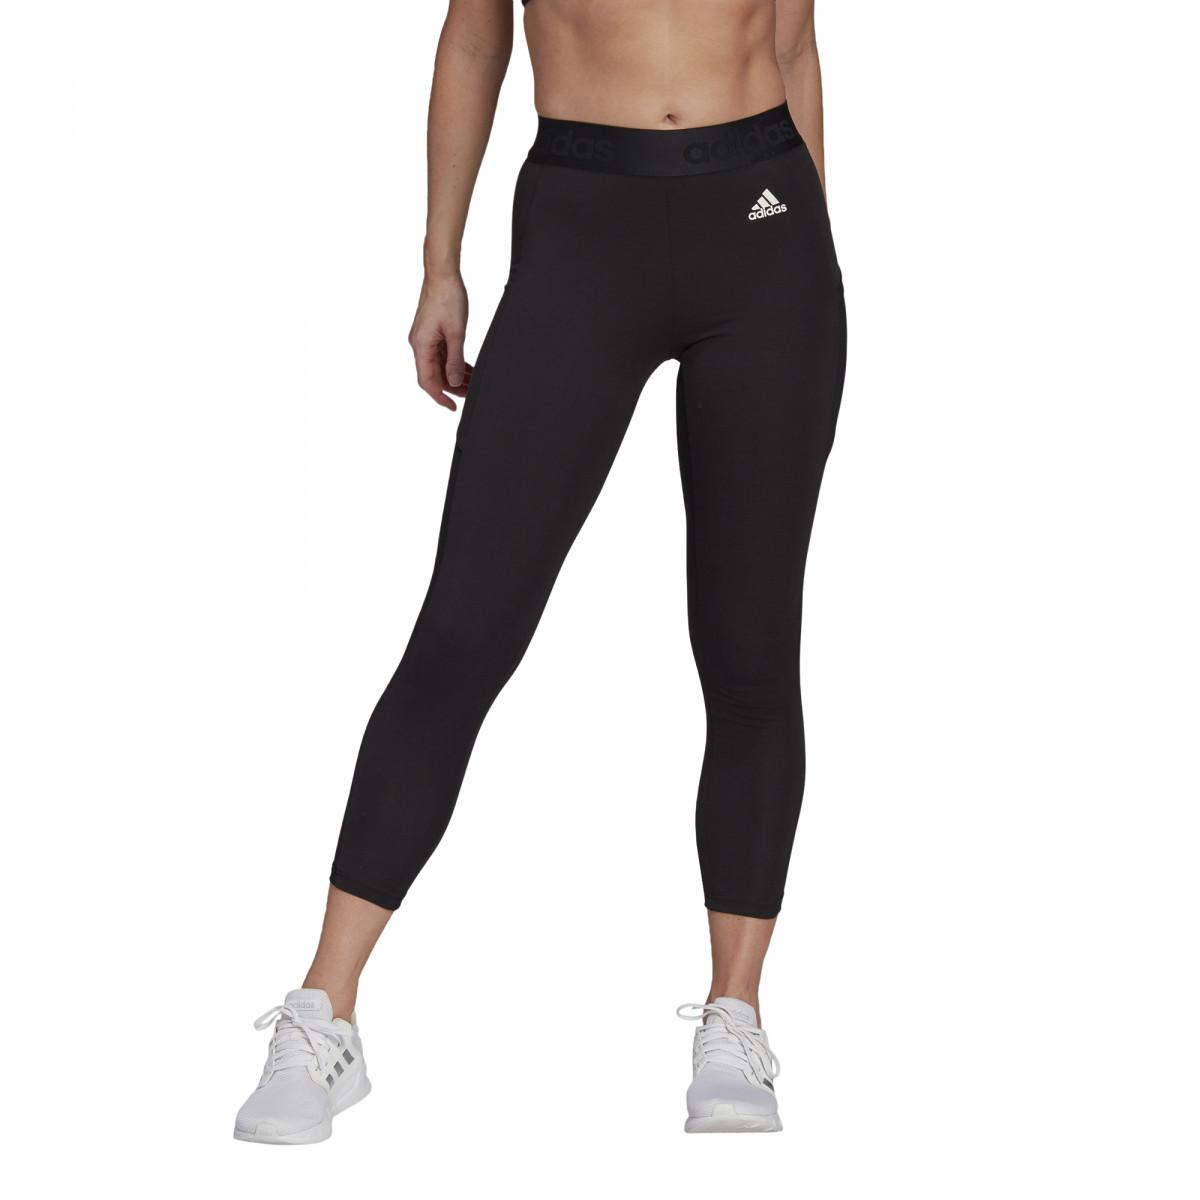 Adidas legíny W Mt 78 Tig black/white Velikost: L